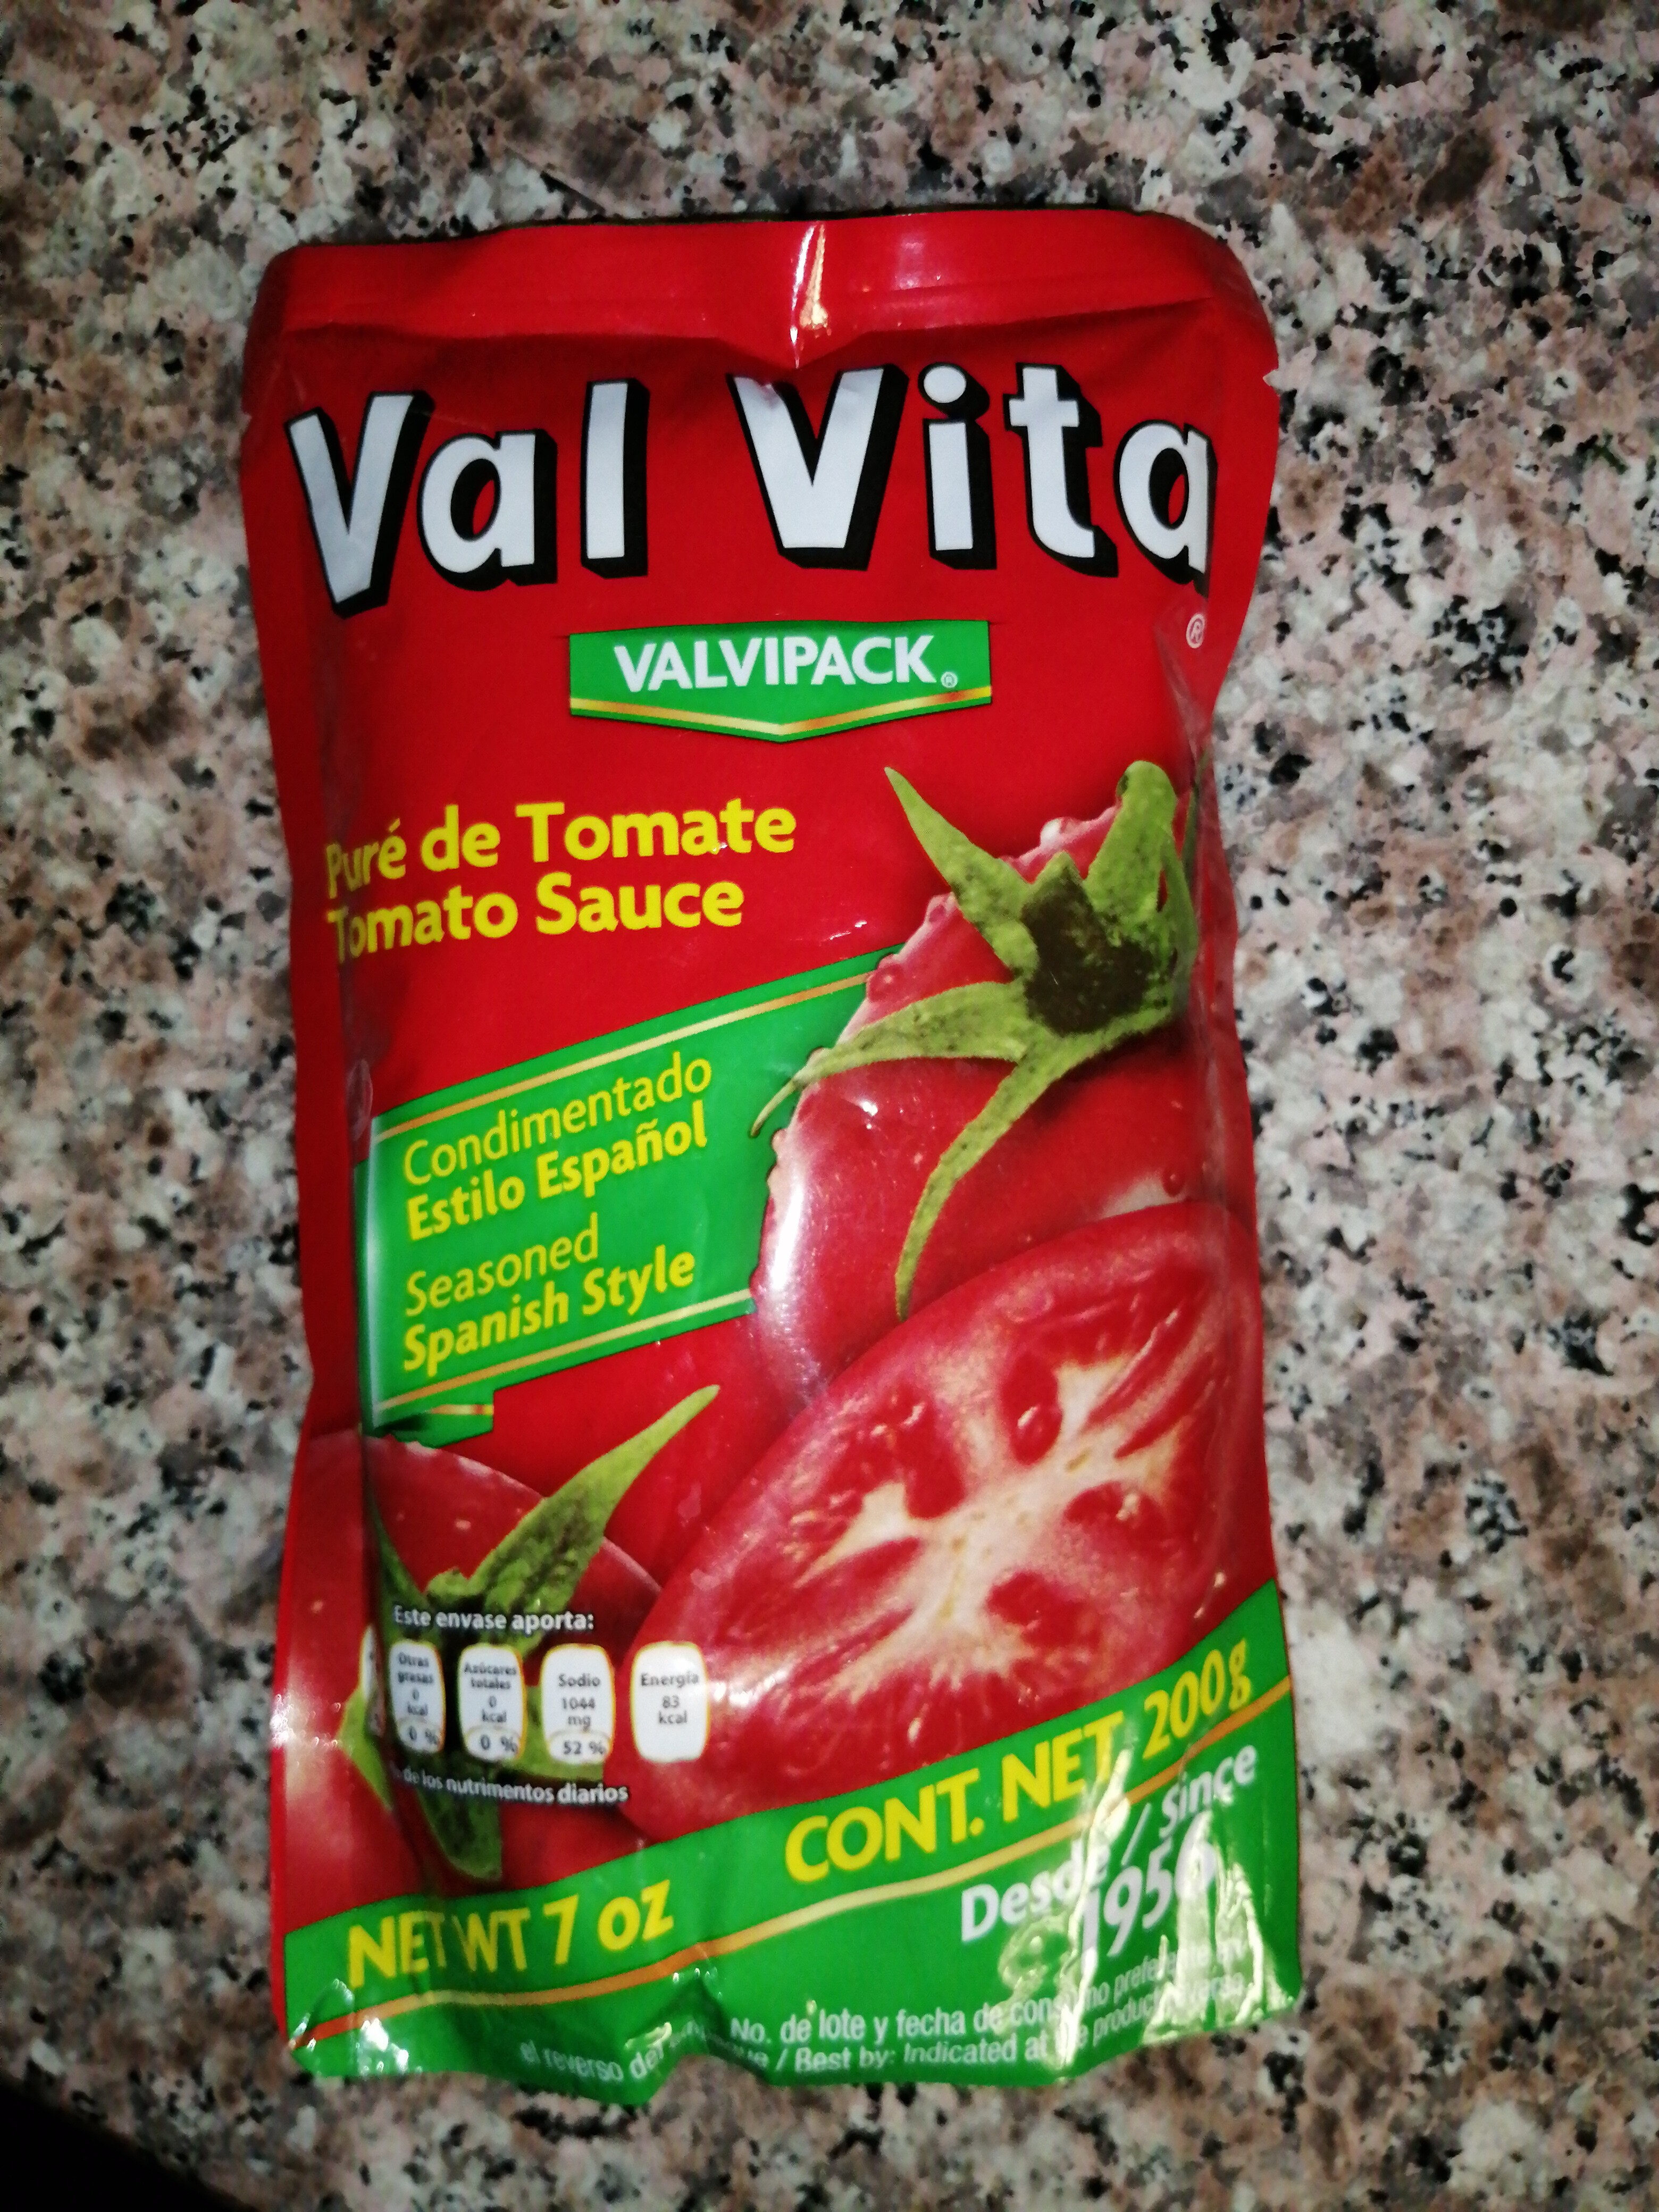 Puré de Tomate Val Vita - Producto - es